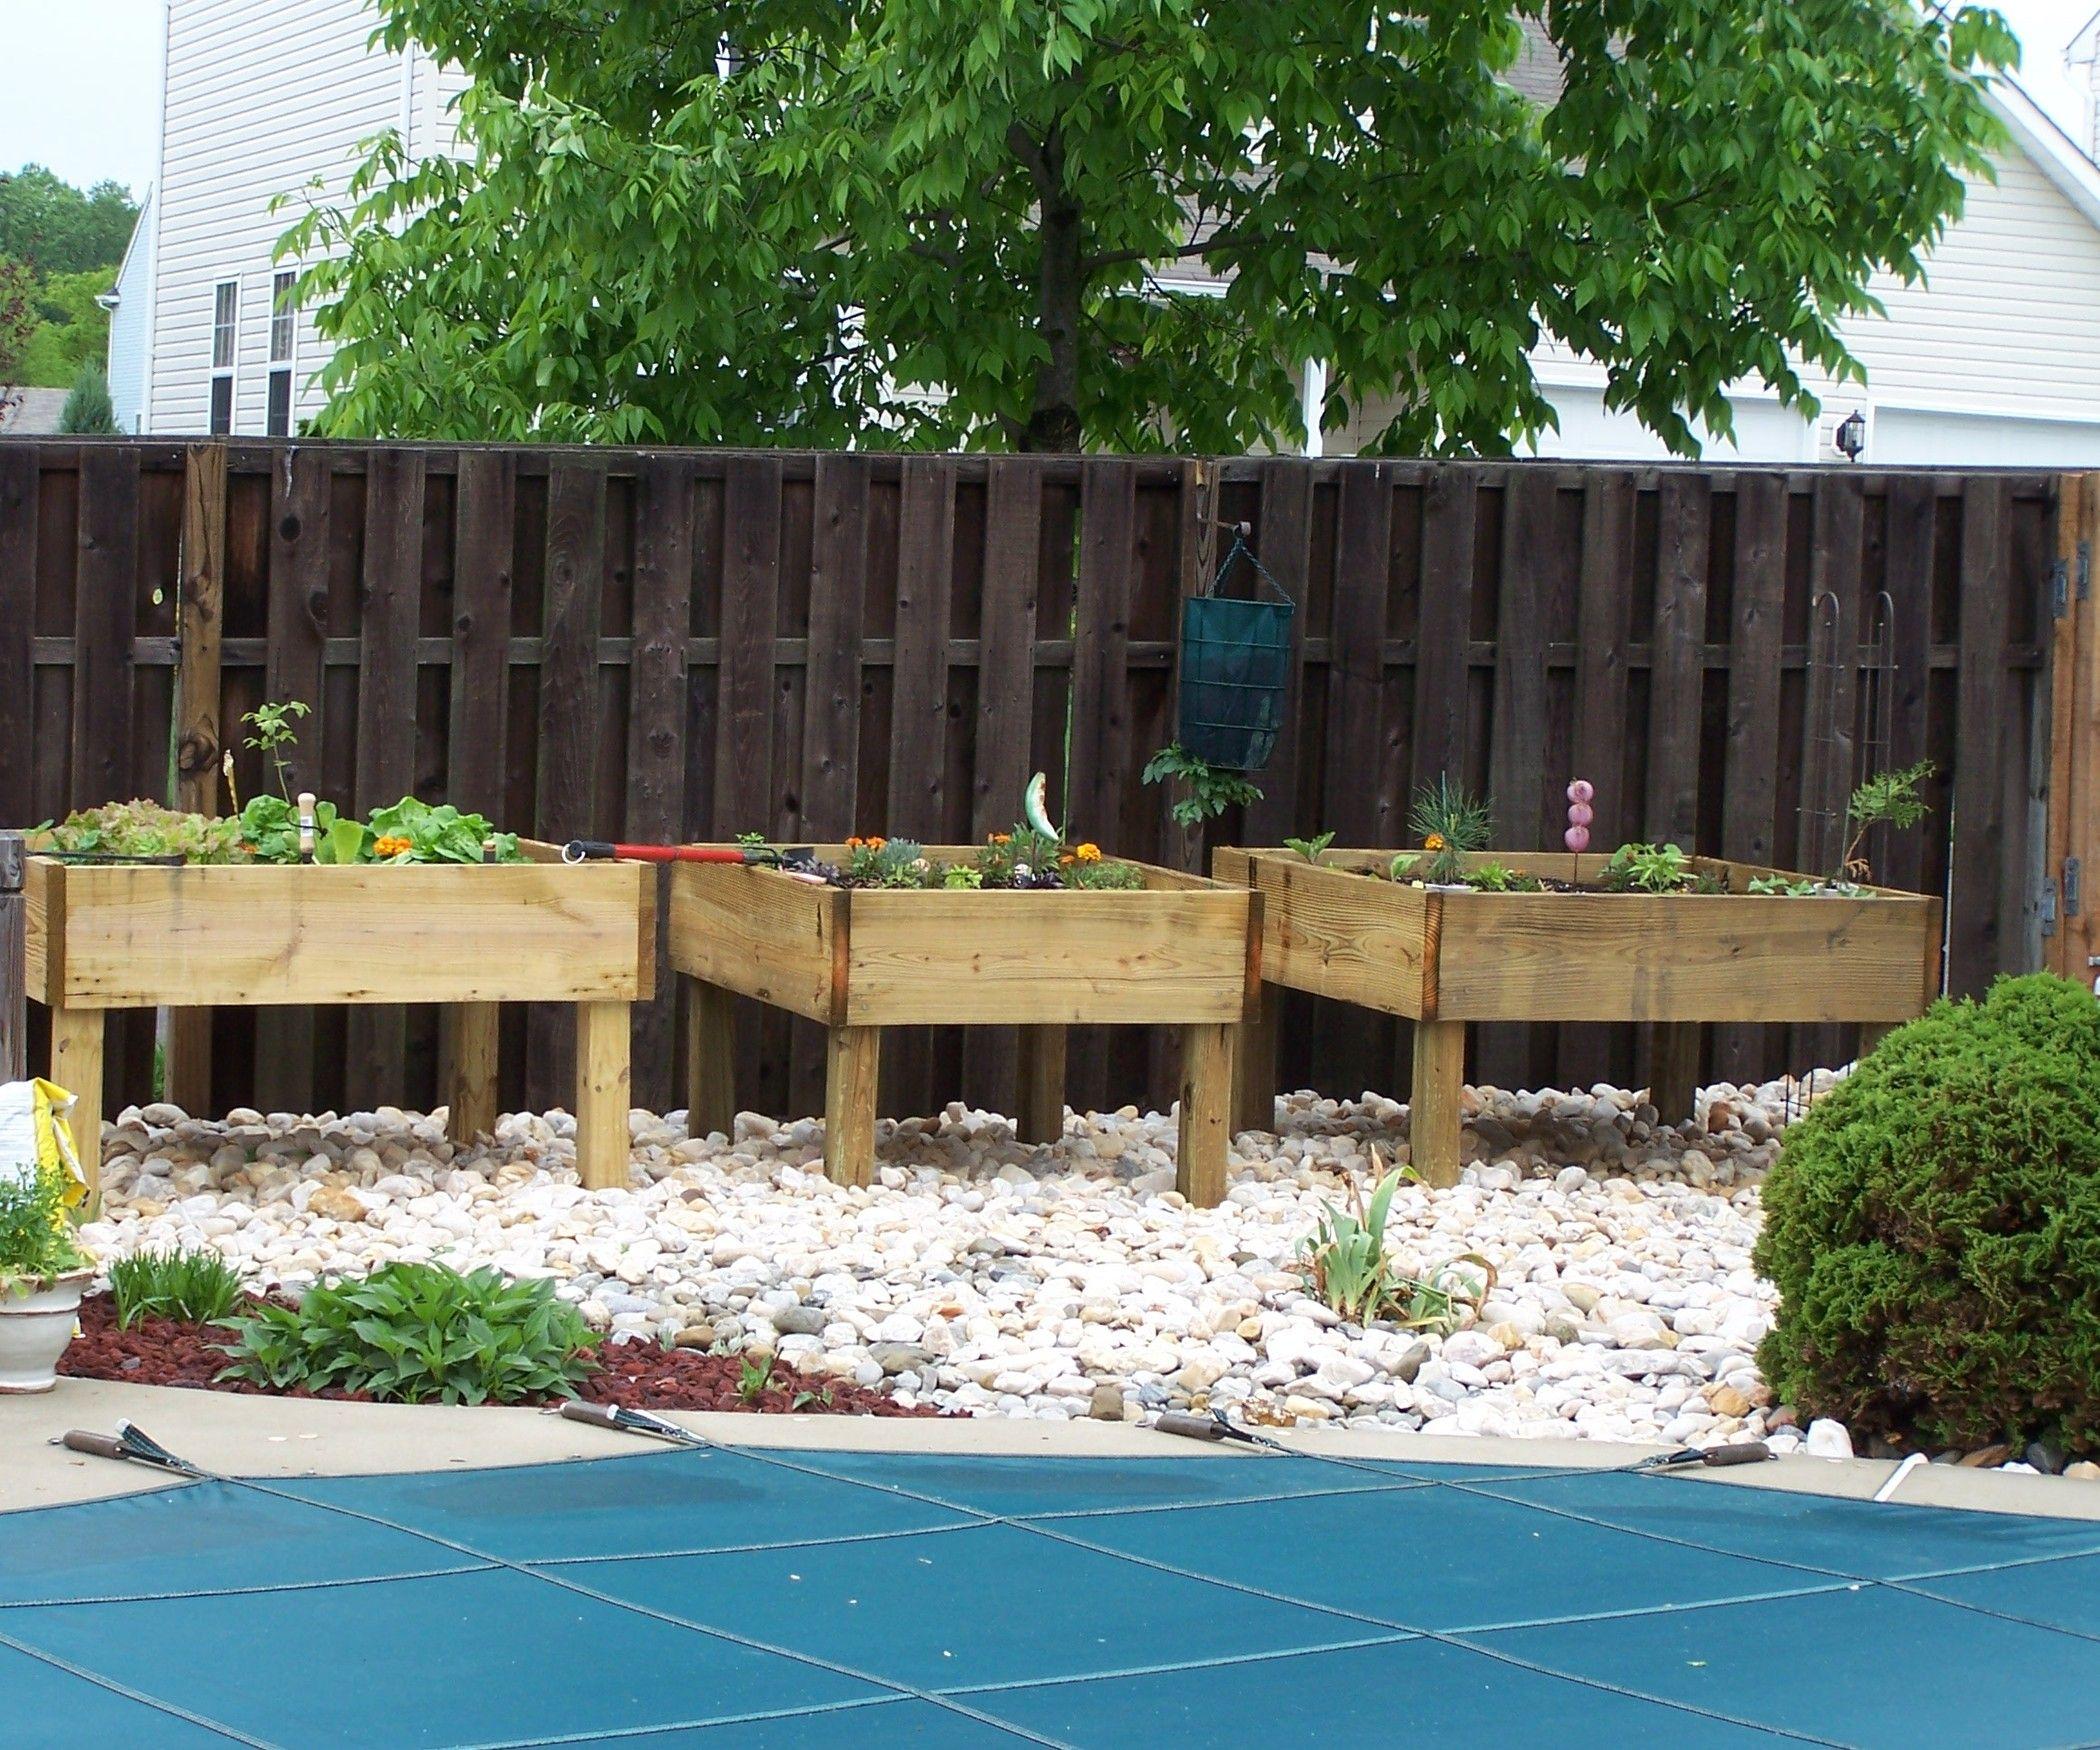 Building Raised Beds For Gardening: Raised Garden Bed - On Legs!